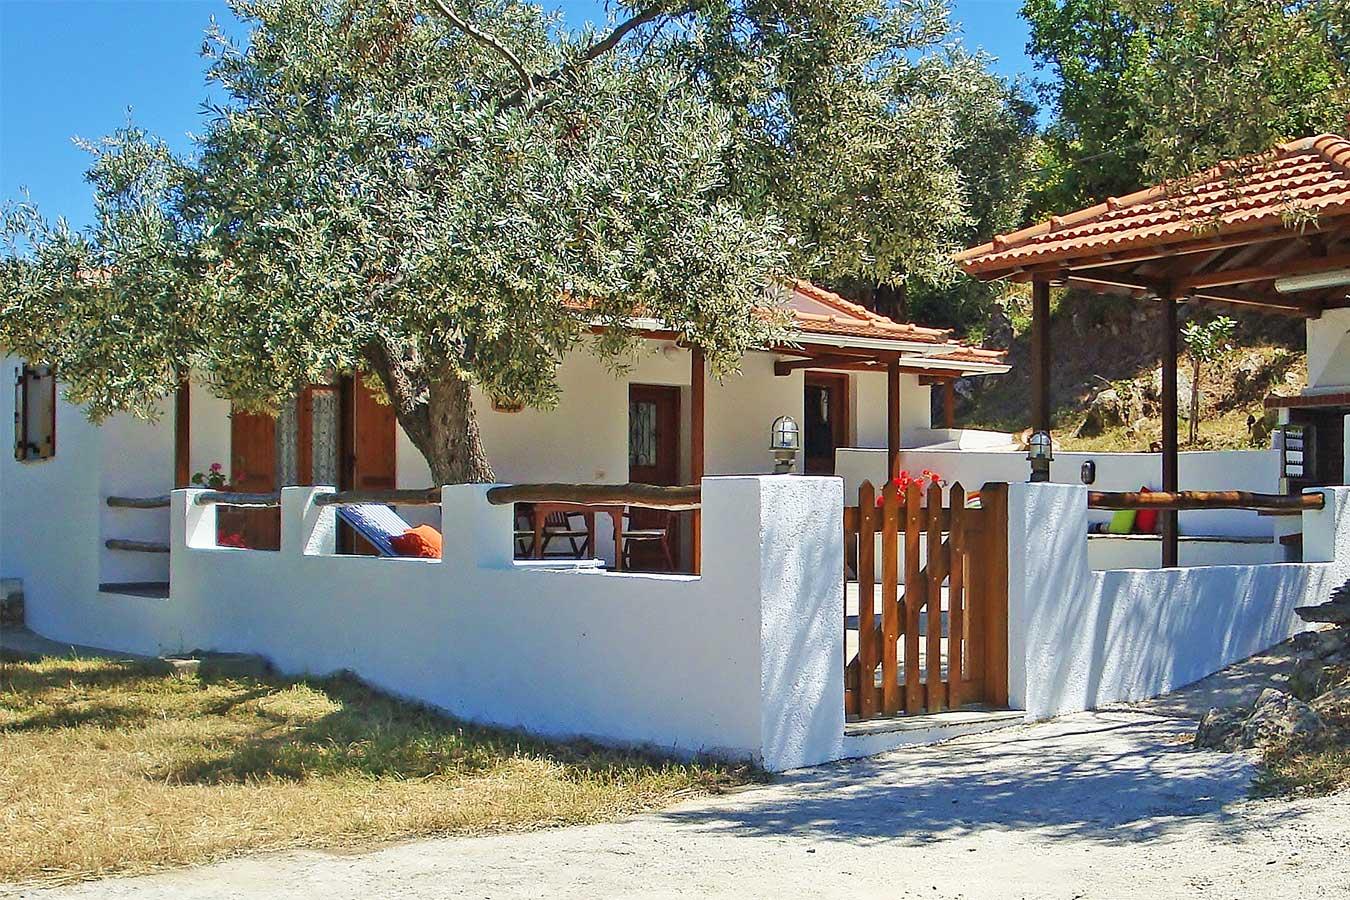 Pan Flute Cottage Skopelos Island Greece